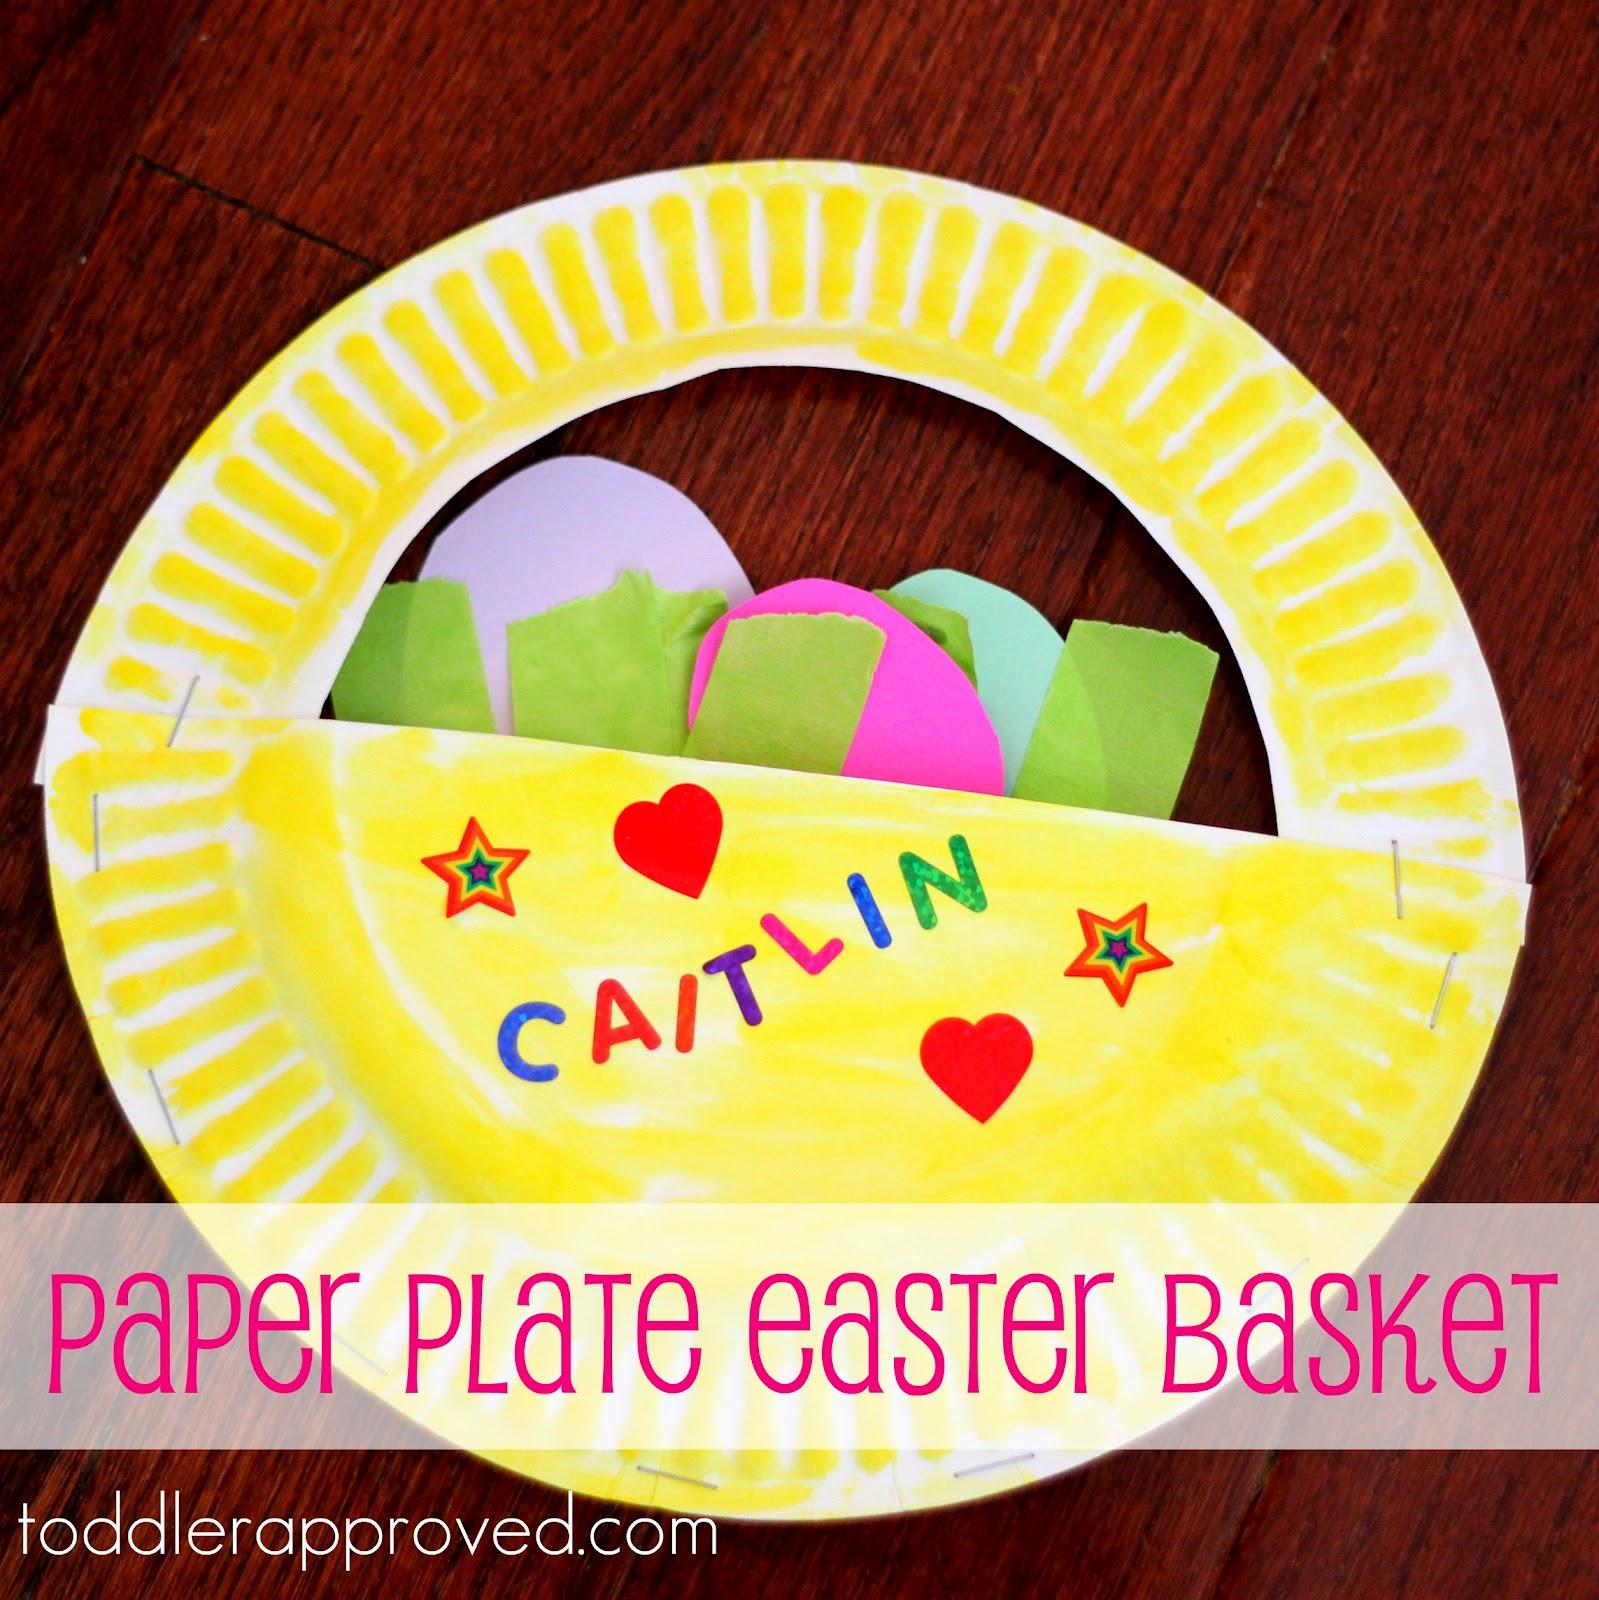 Paper Plate Easter Basket & Toddler Approved!: Paper Plate Easter Basket